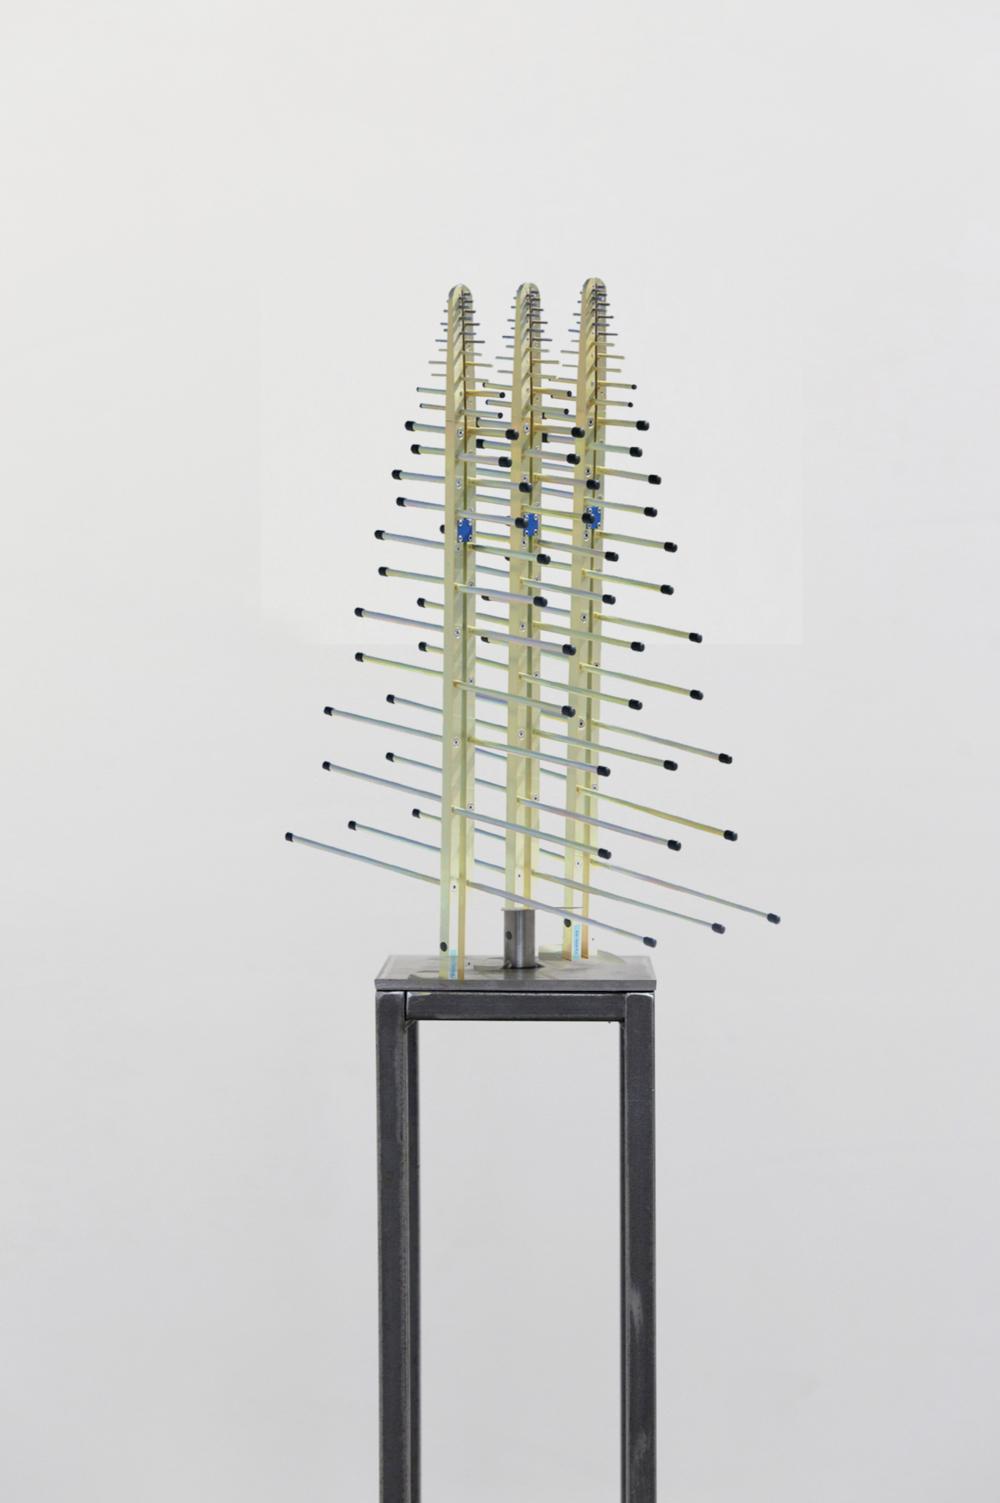 4D Tentacles, Yellow Zinc, Steel, Plastic, 2018